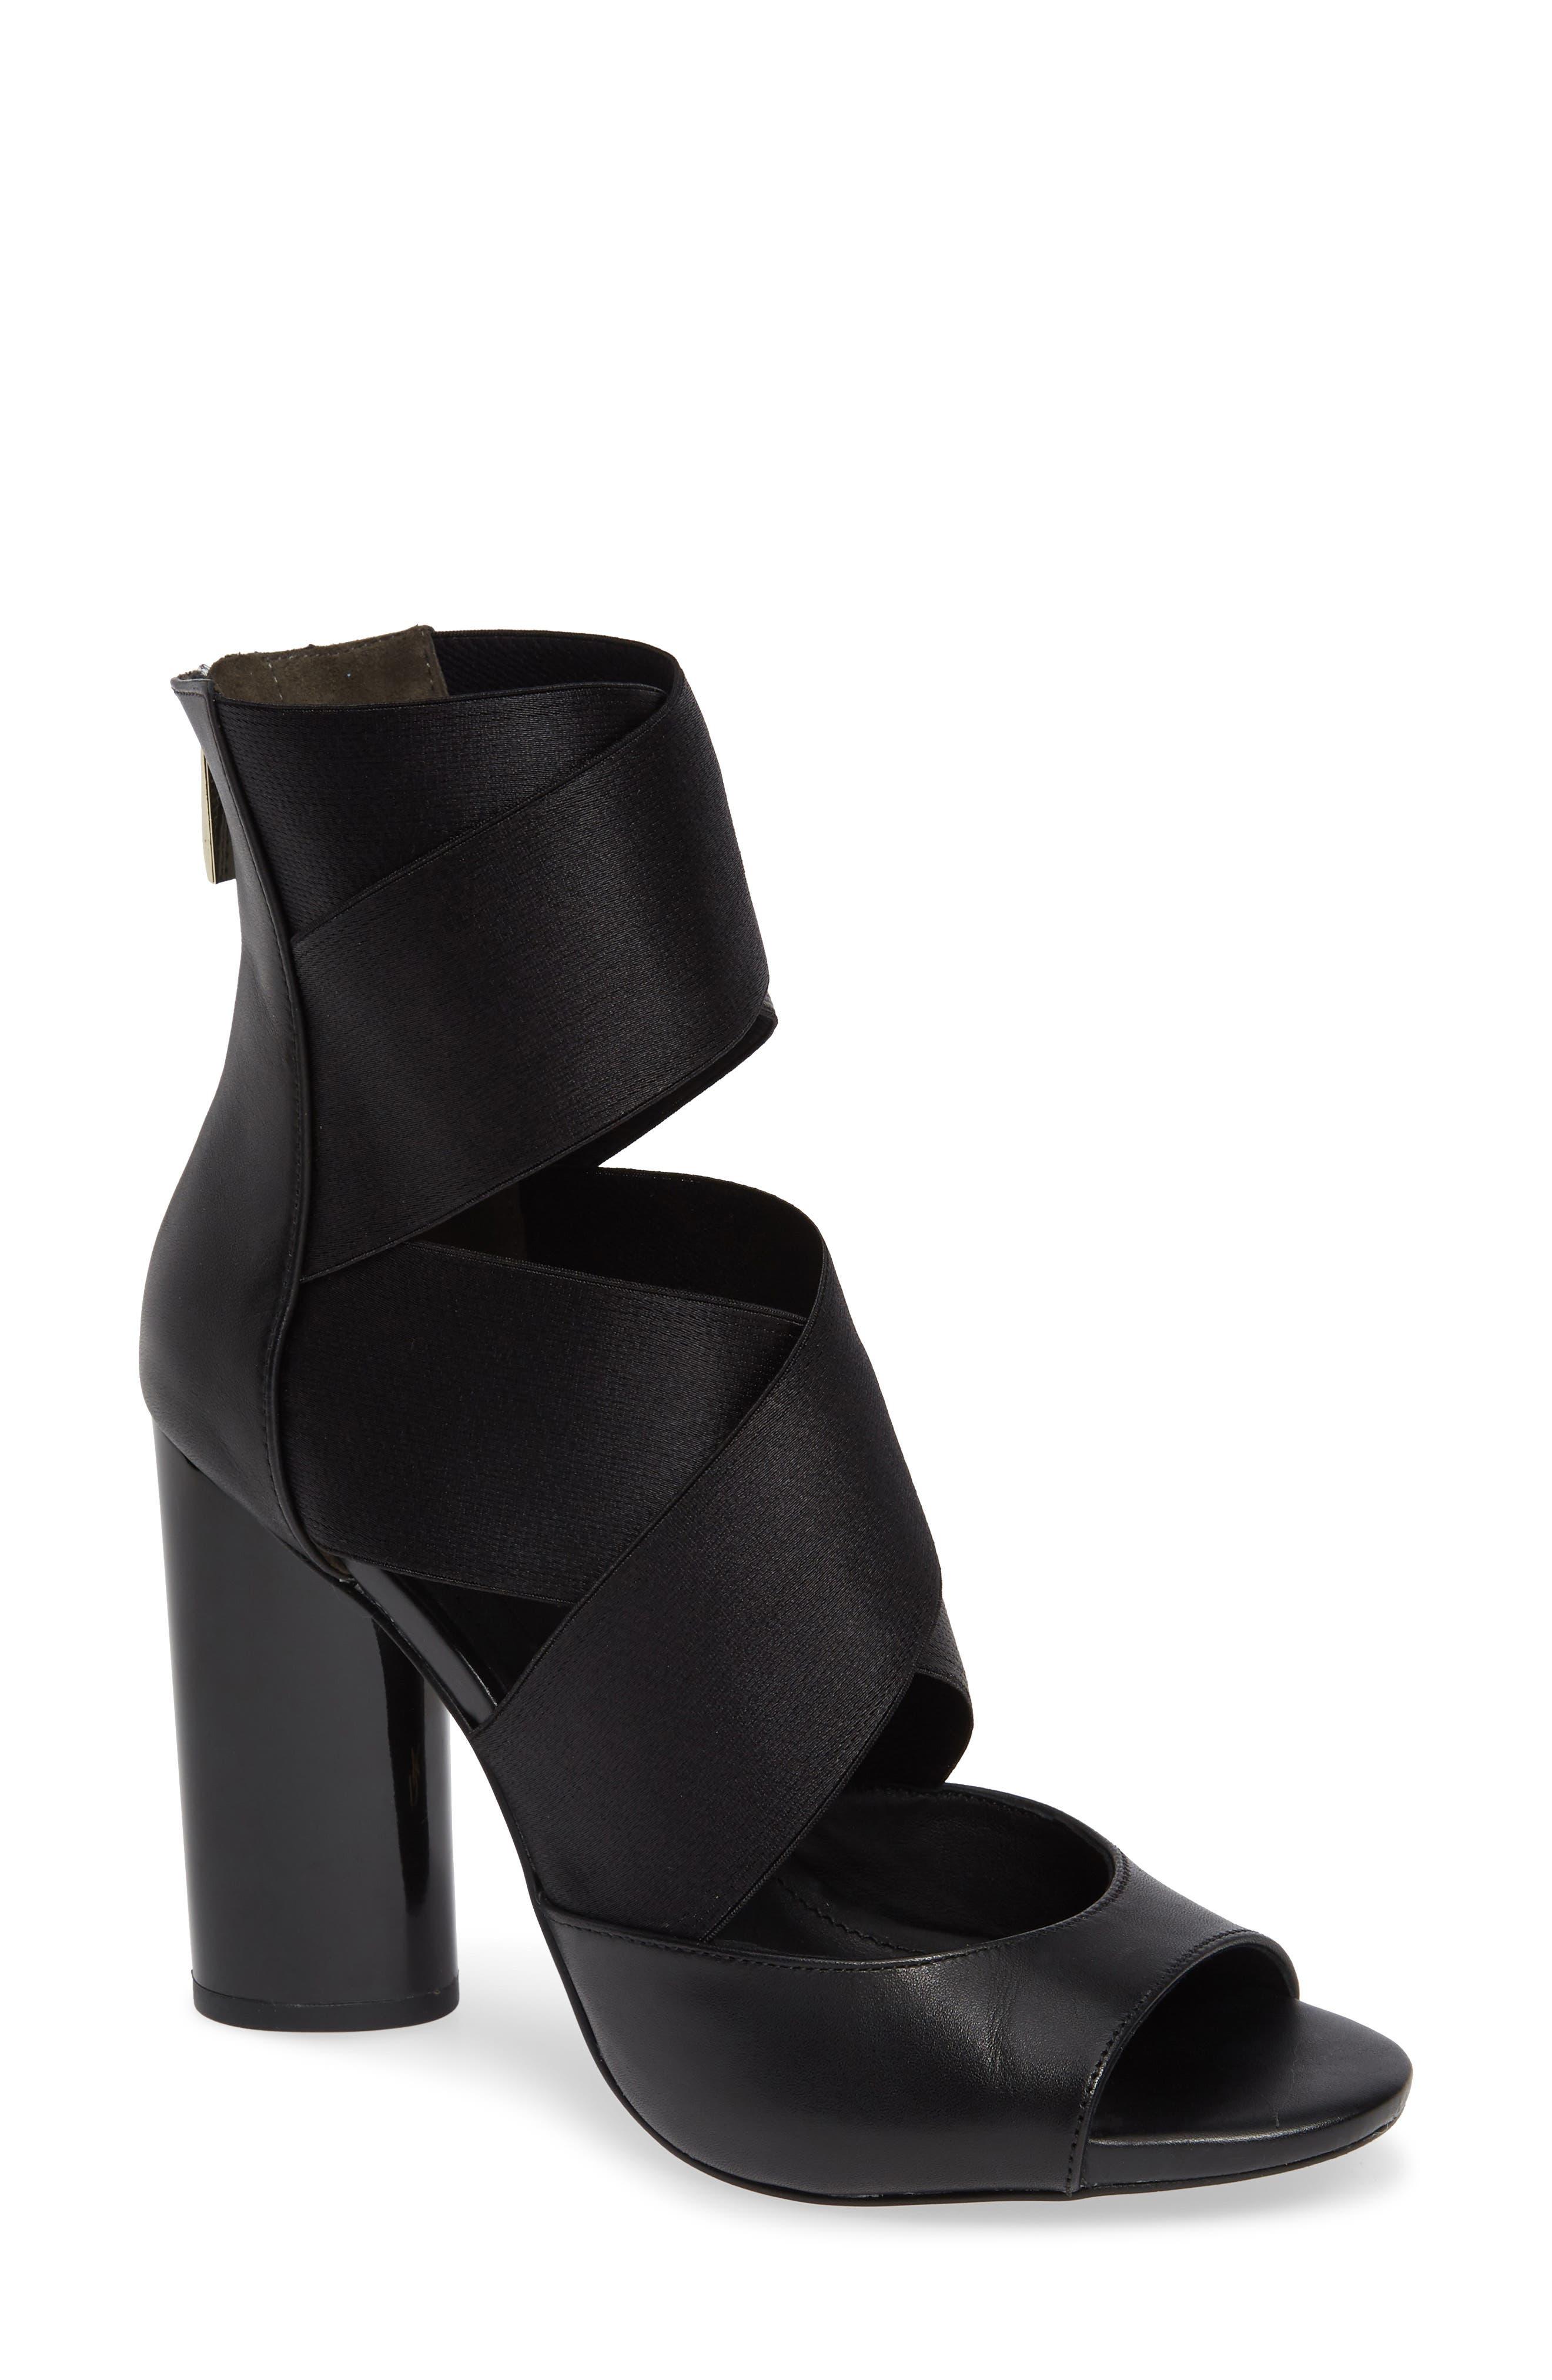 Donna Karan Briana Strappy High Sandal- Black